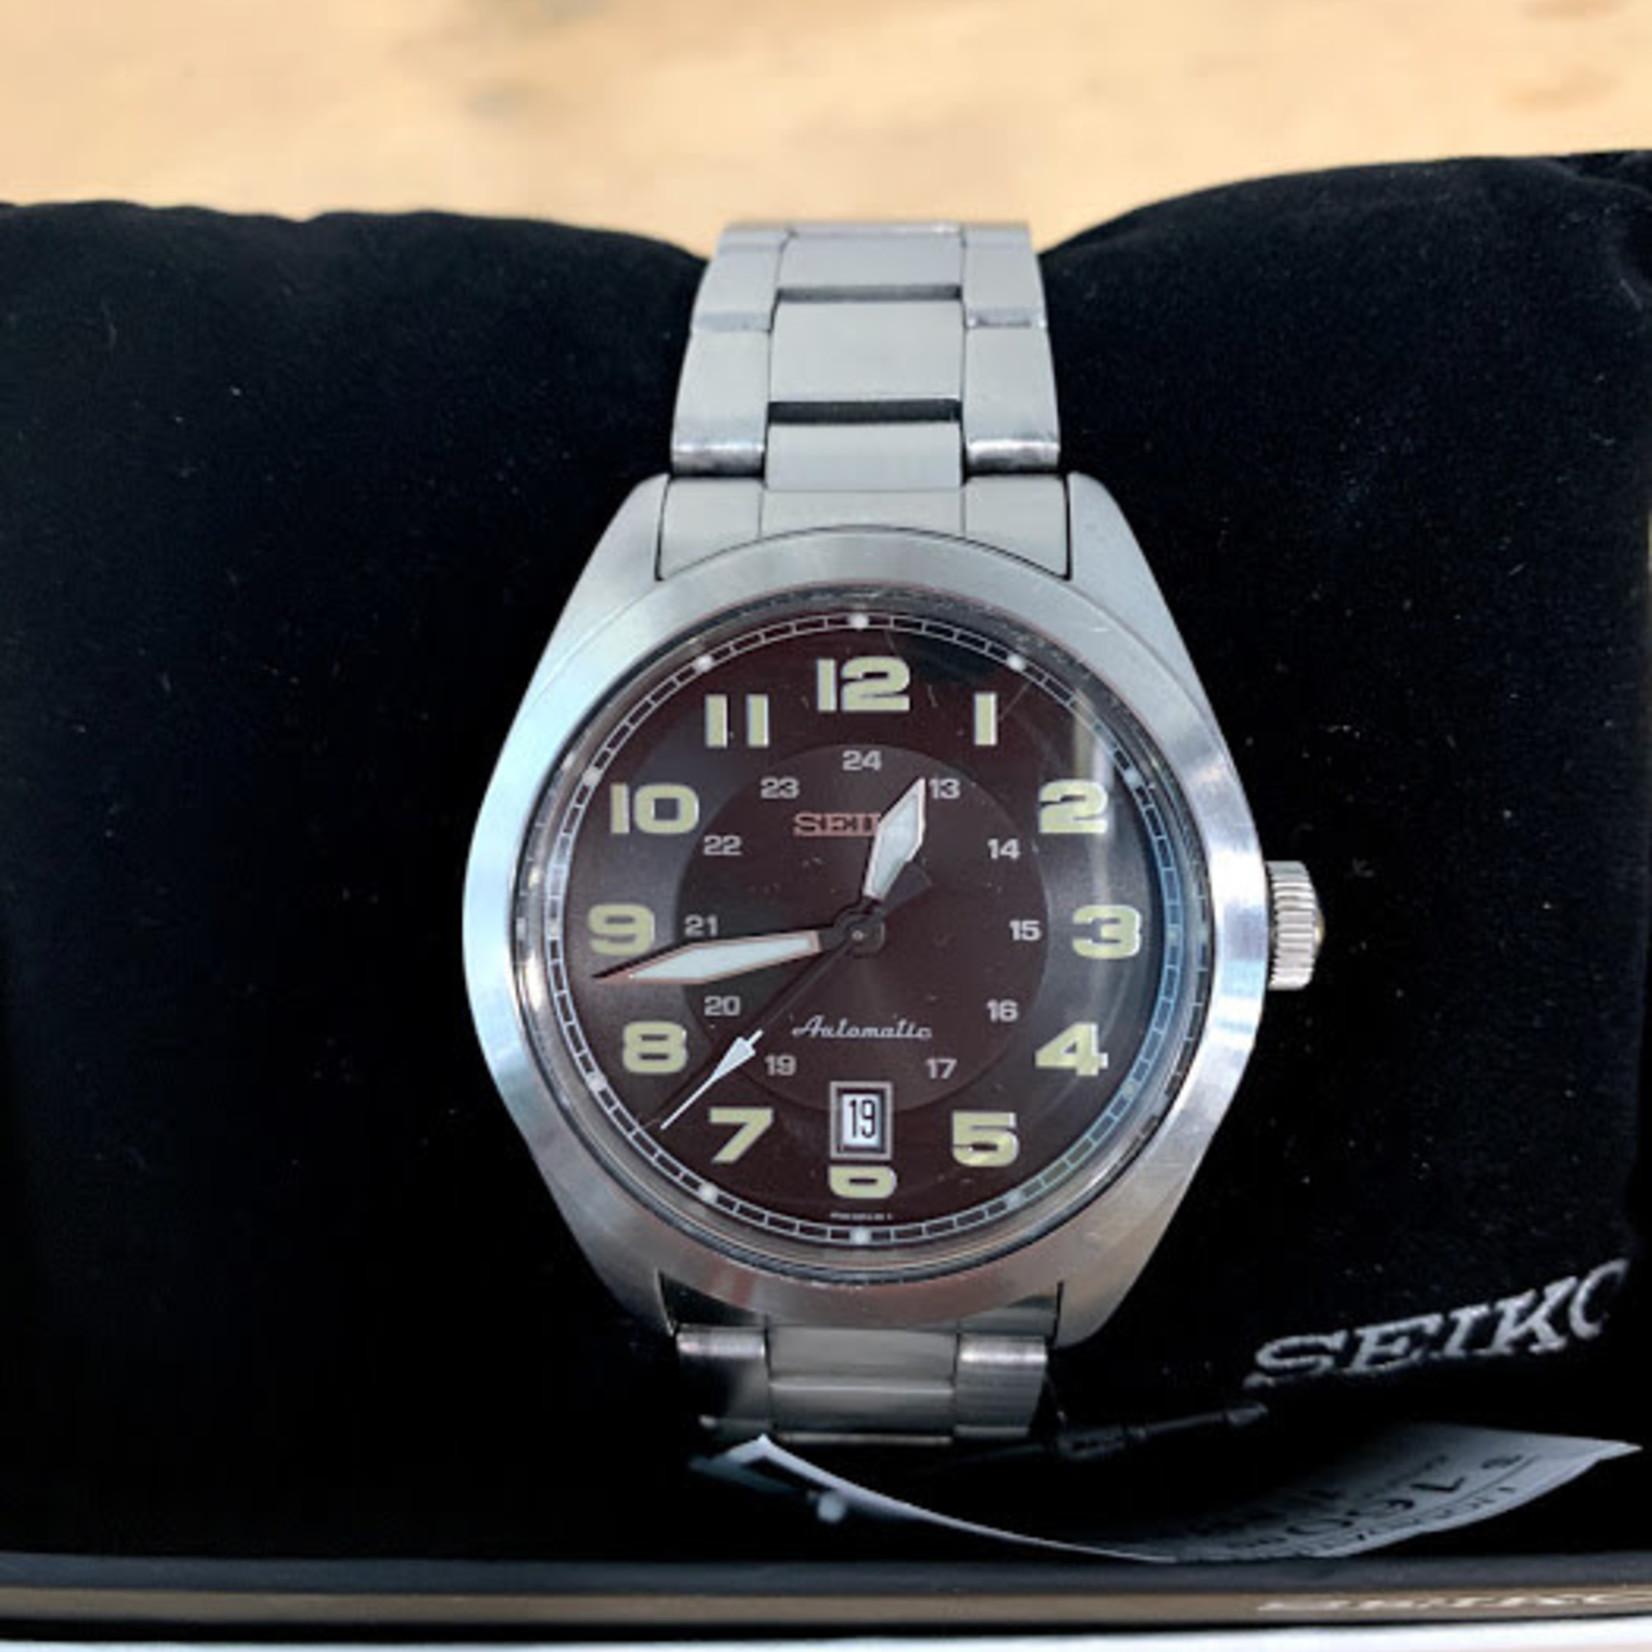 SEIKO Neo Sports Automatic Black Dial Men's Watch SRPC85K1 *Minor scuffs on wrist band